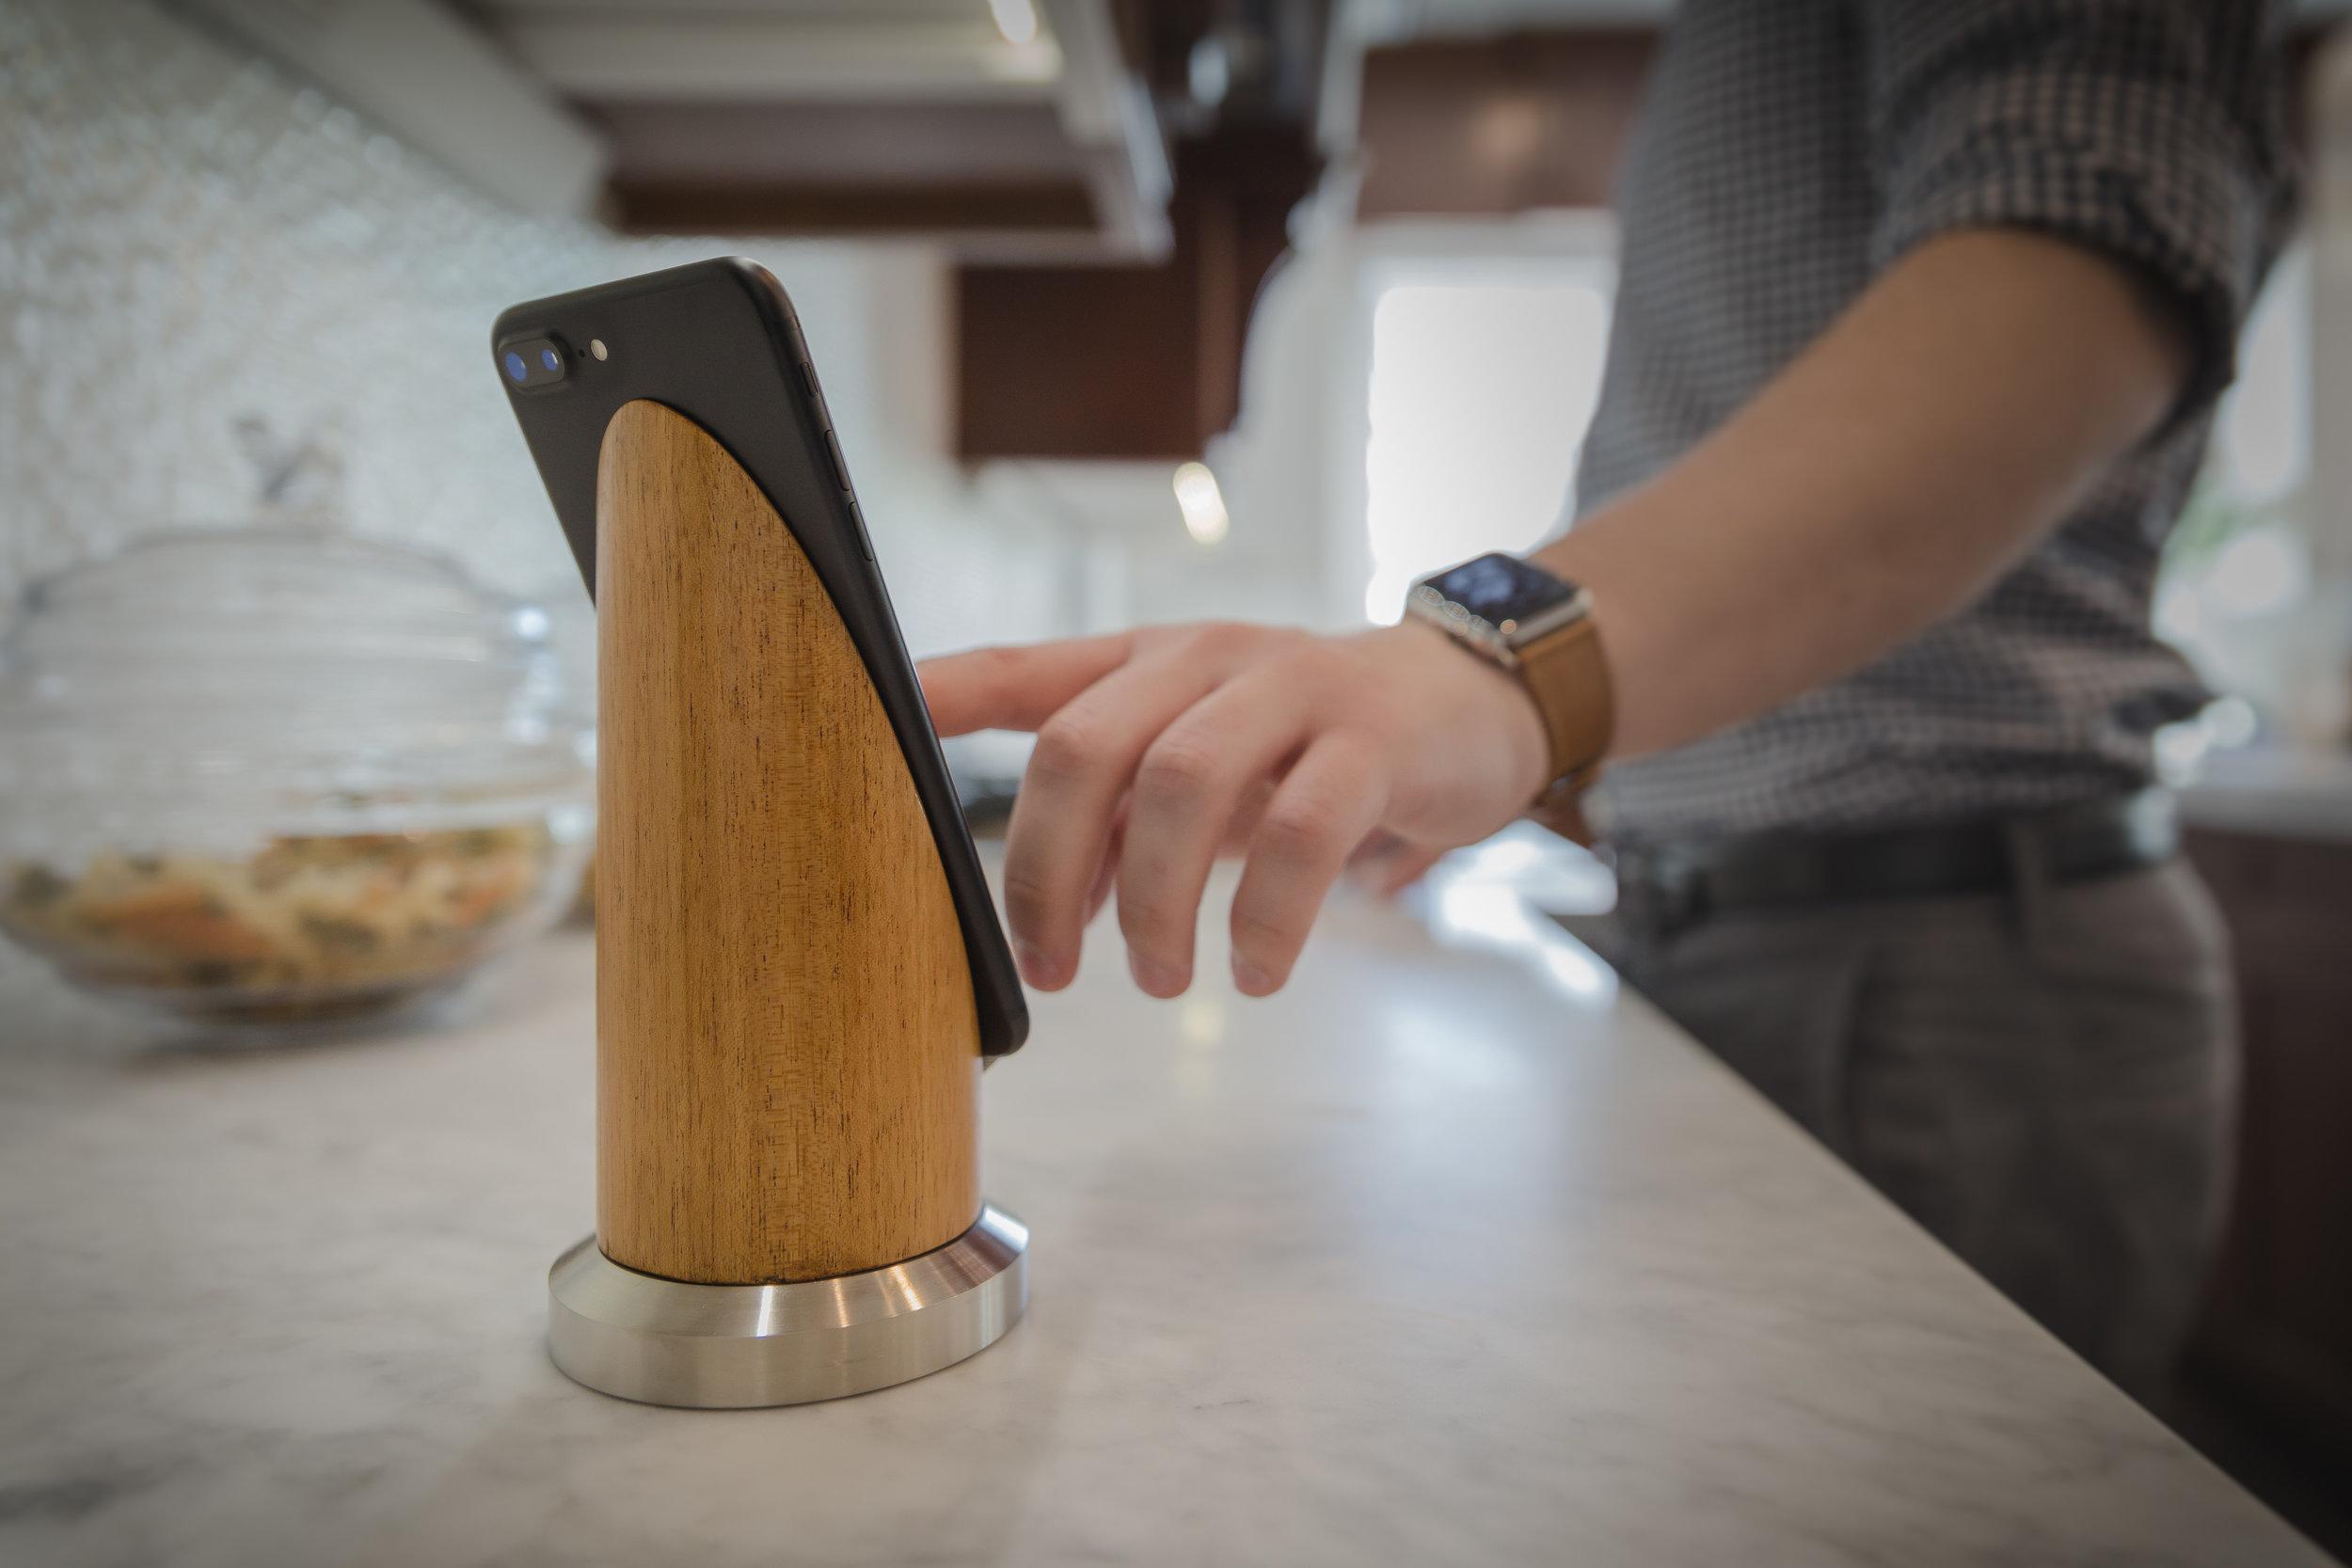 Pinnacle phone stand